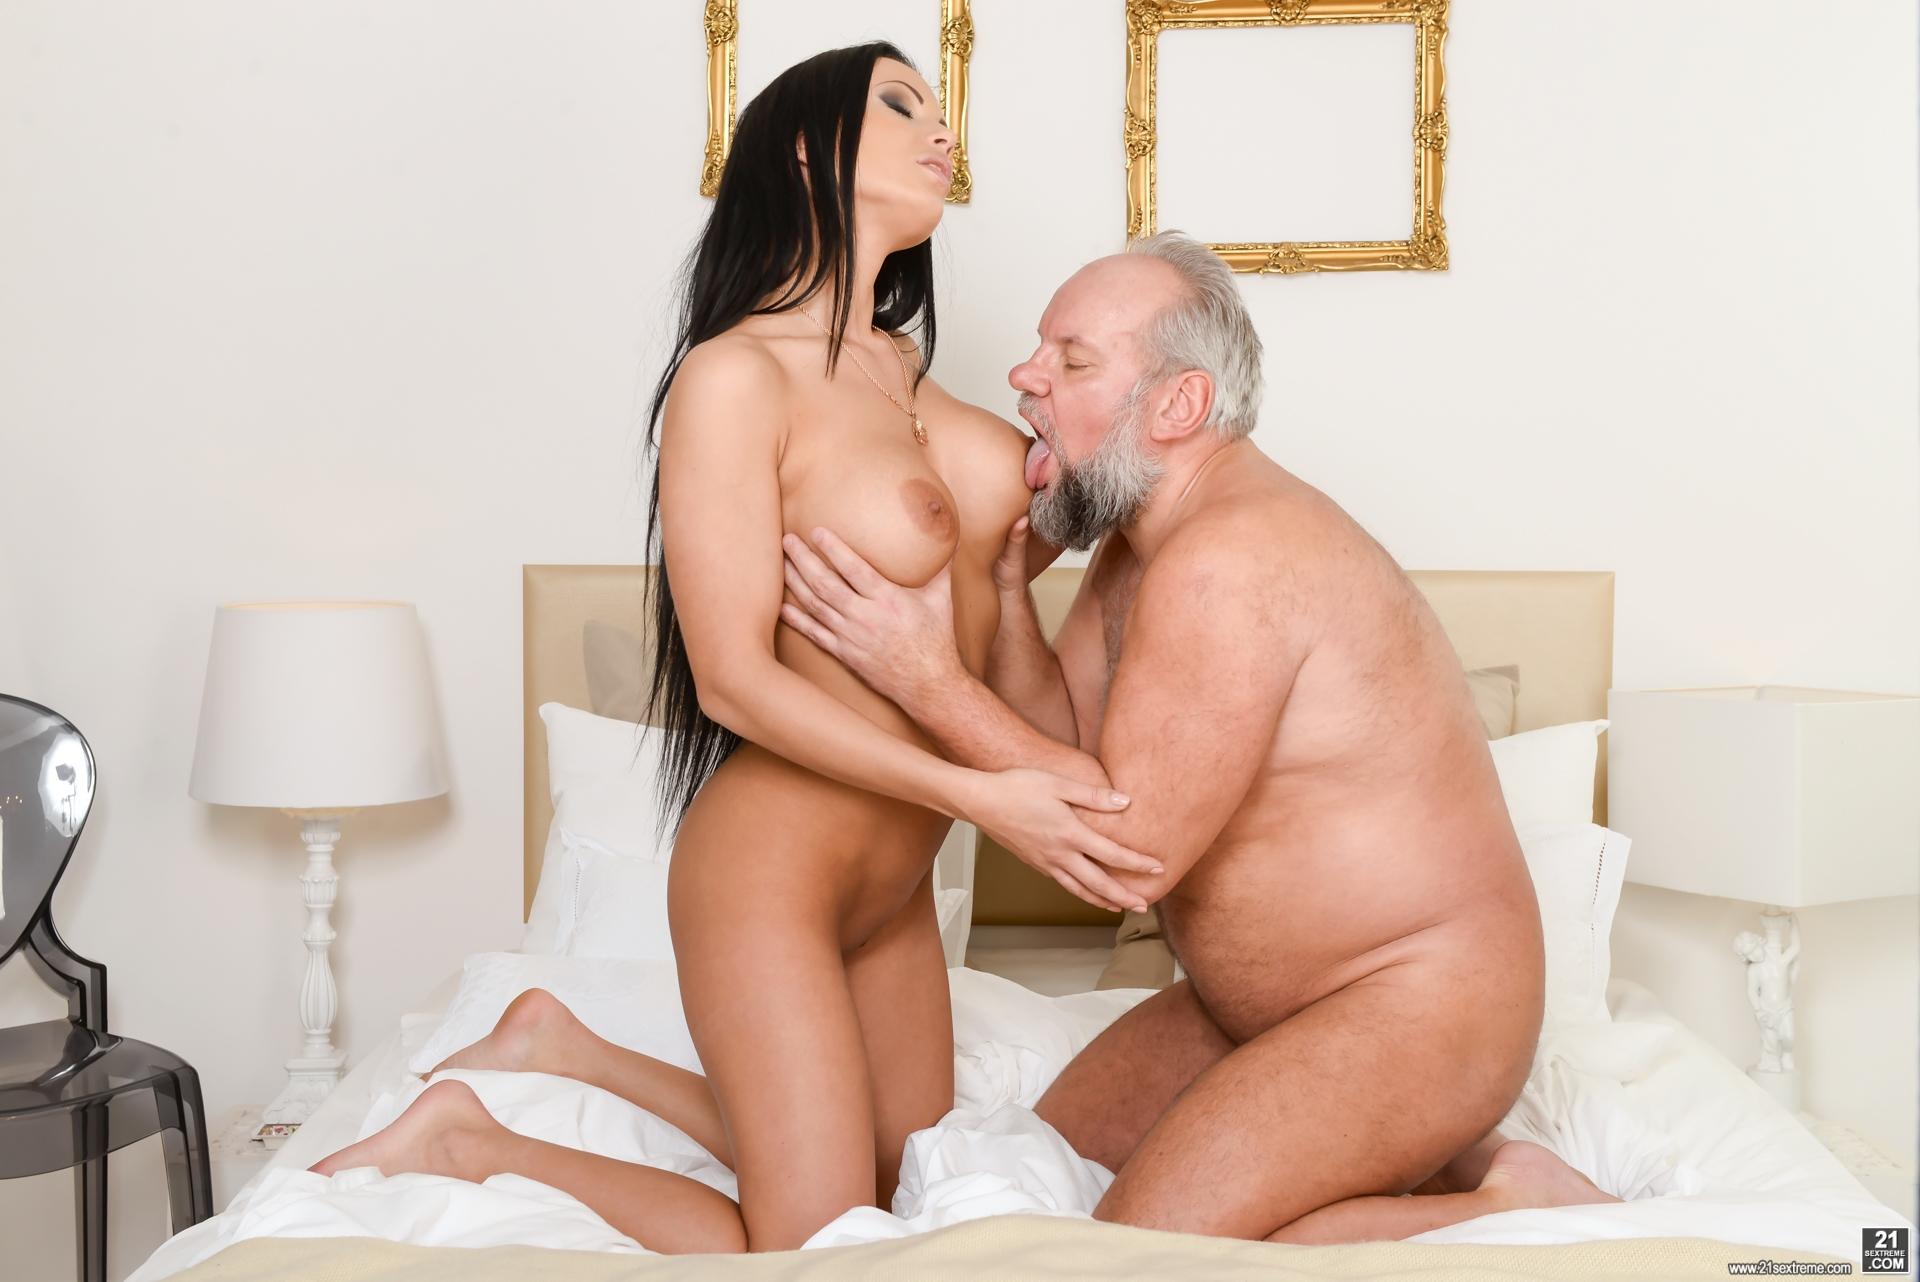 Summer glau nude celeb photos